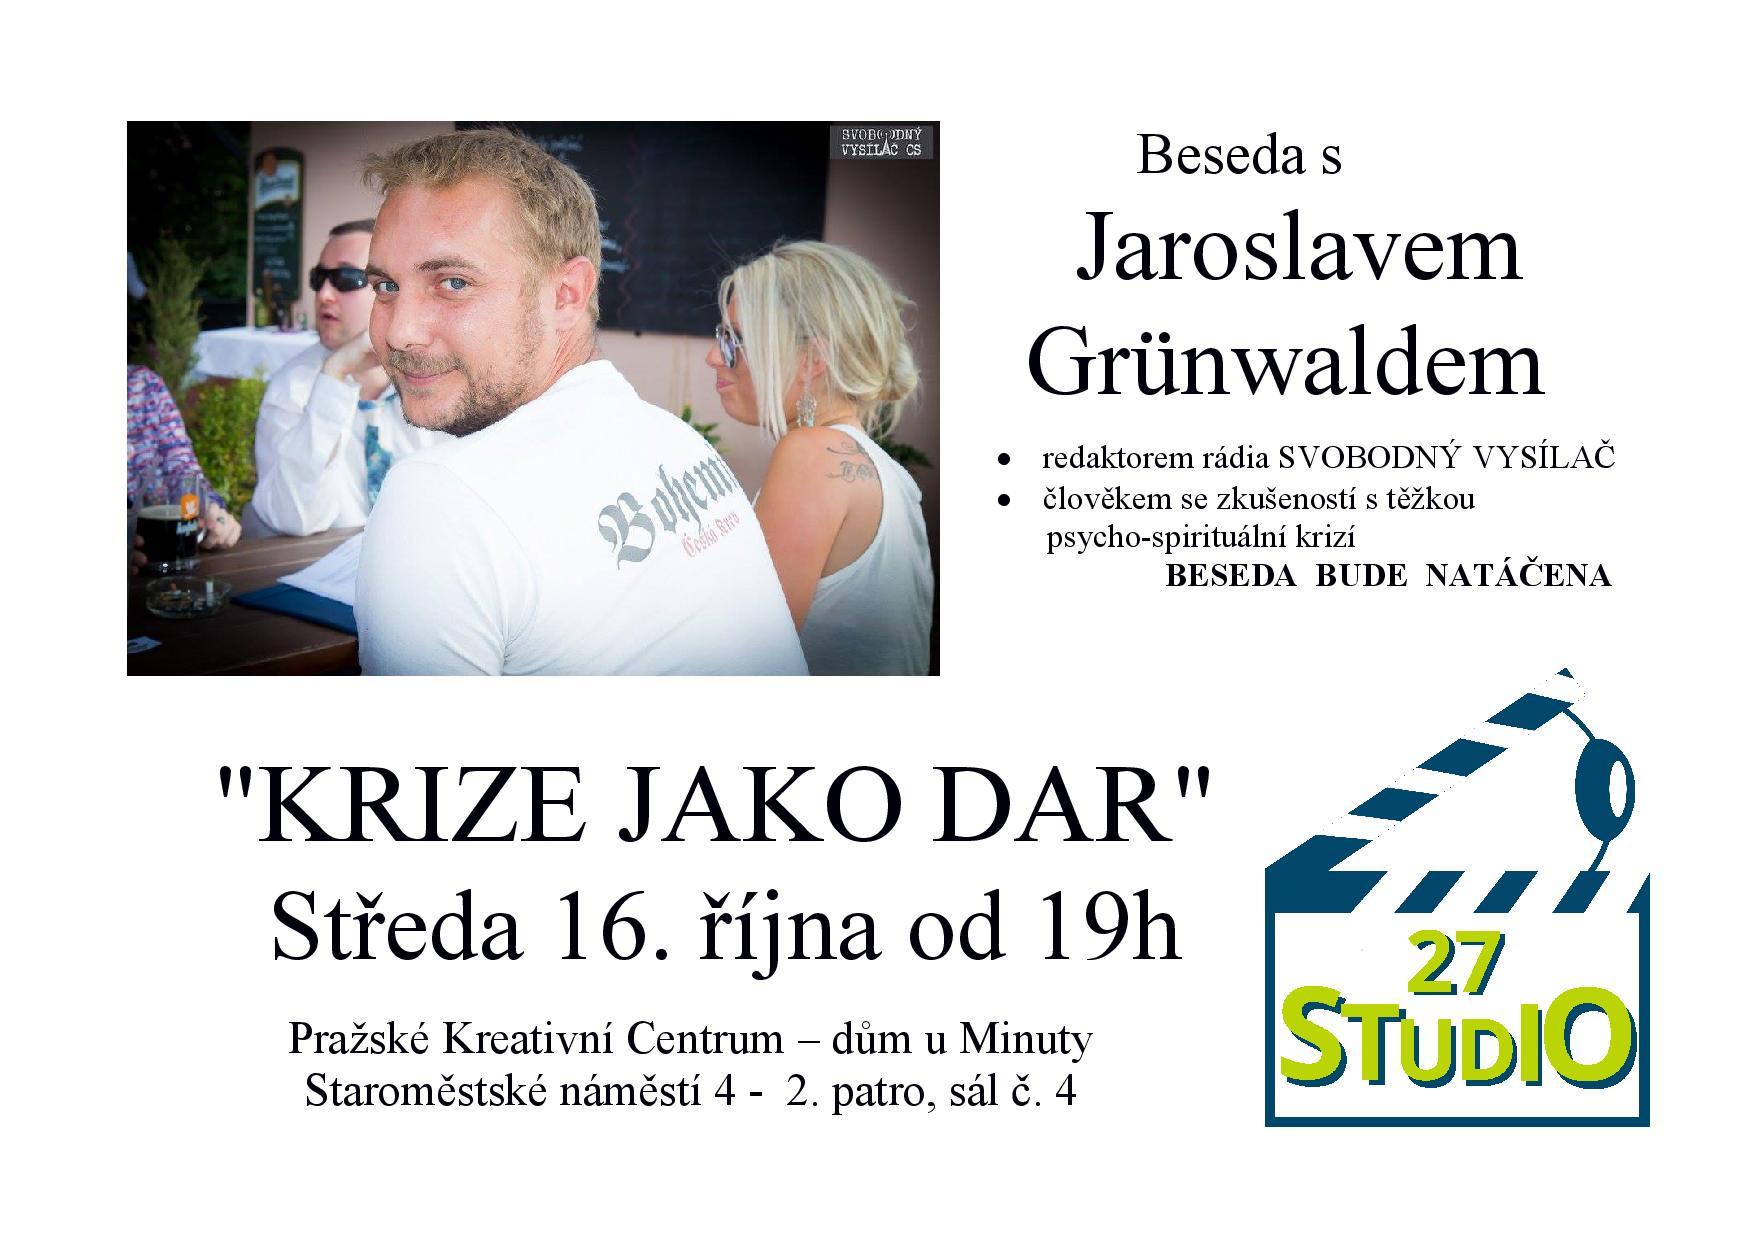 Studio 27 - Jaroslav Grünwald - Krize jako dar - 16. října 2019, Kreativní centrum